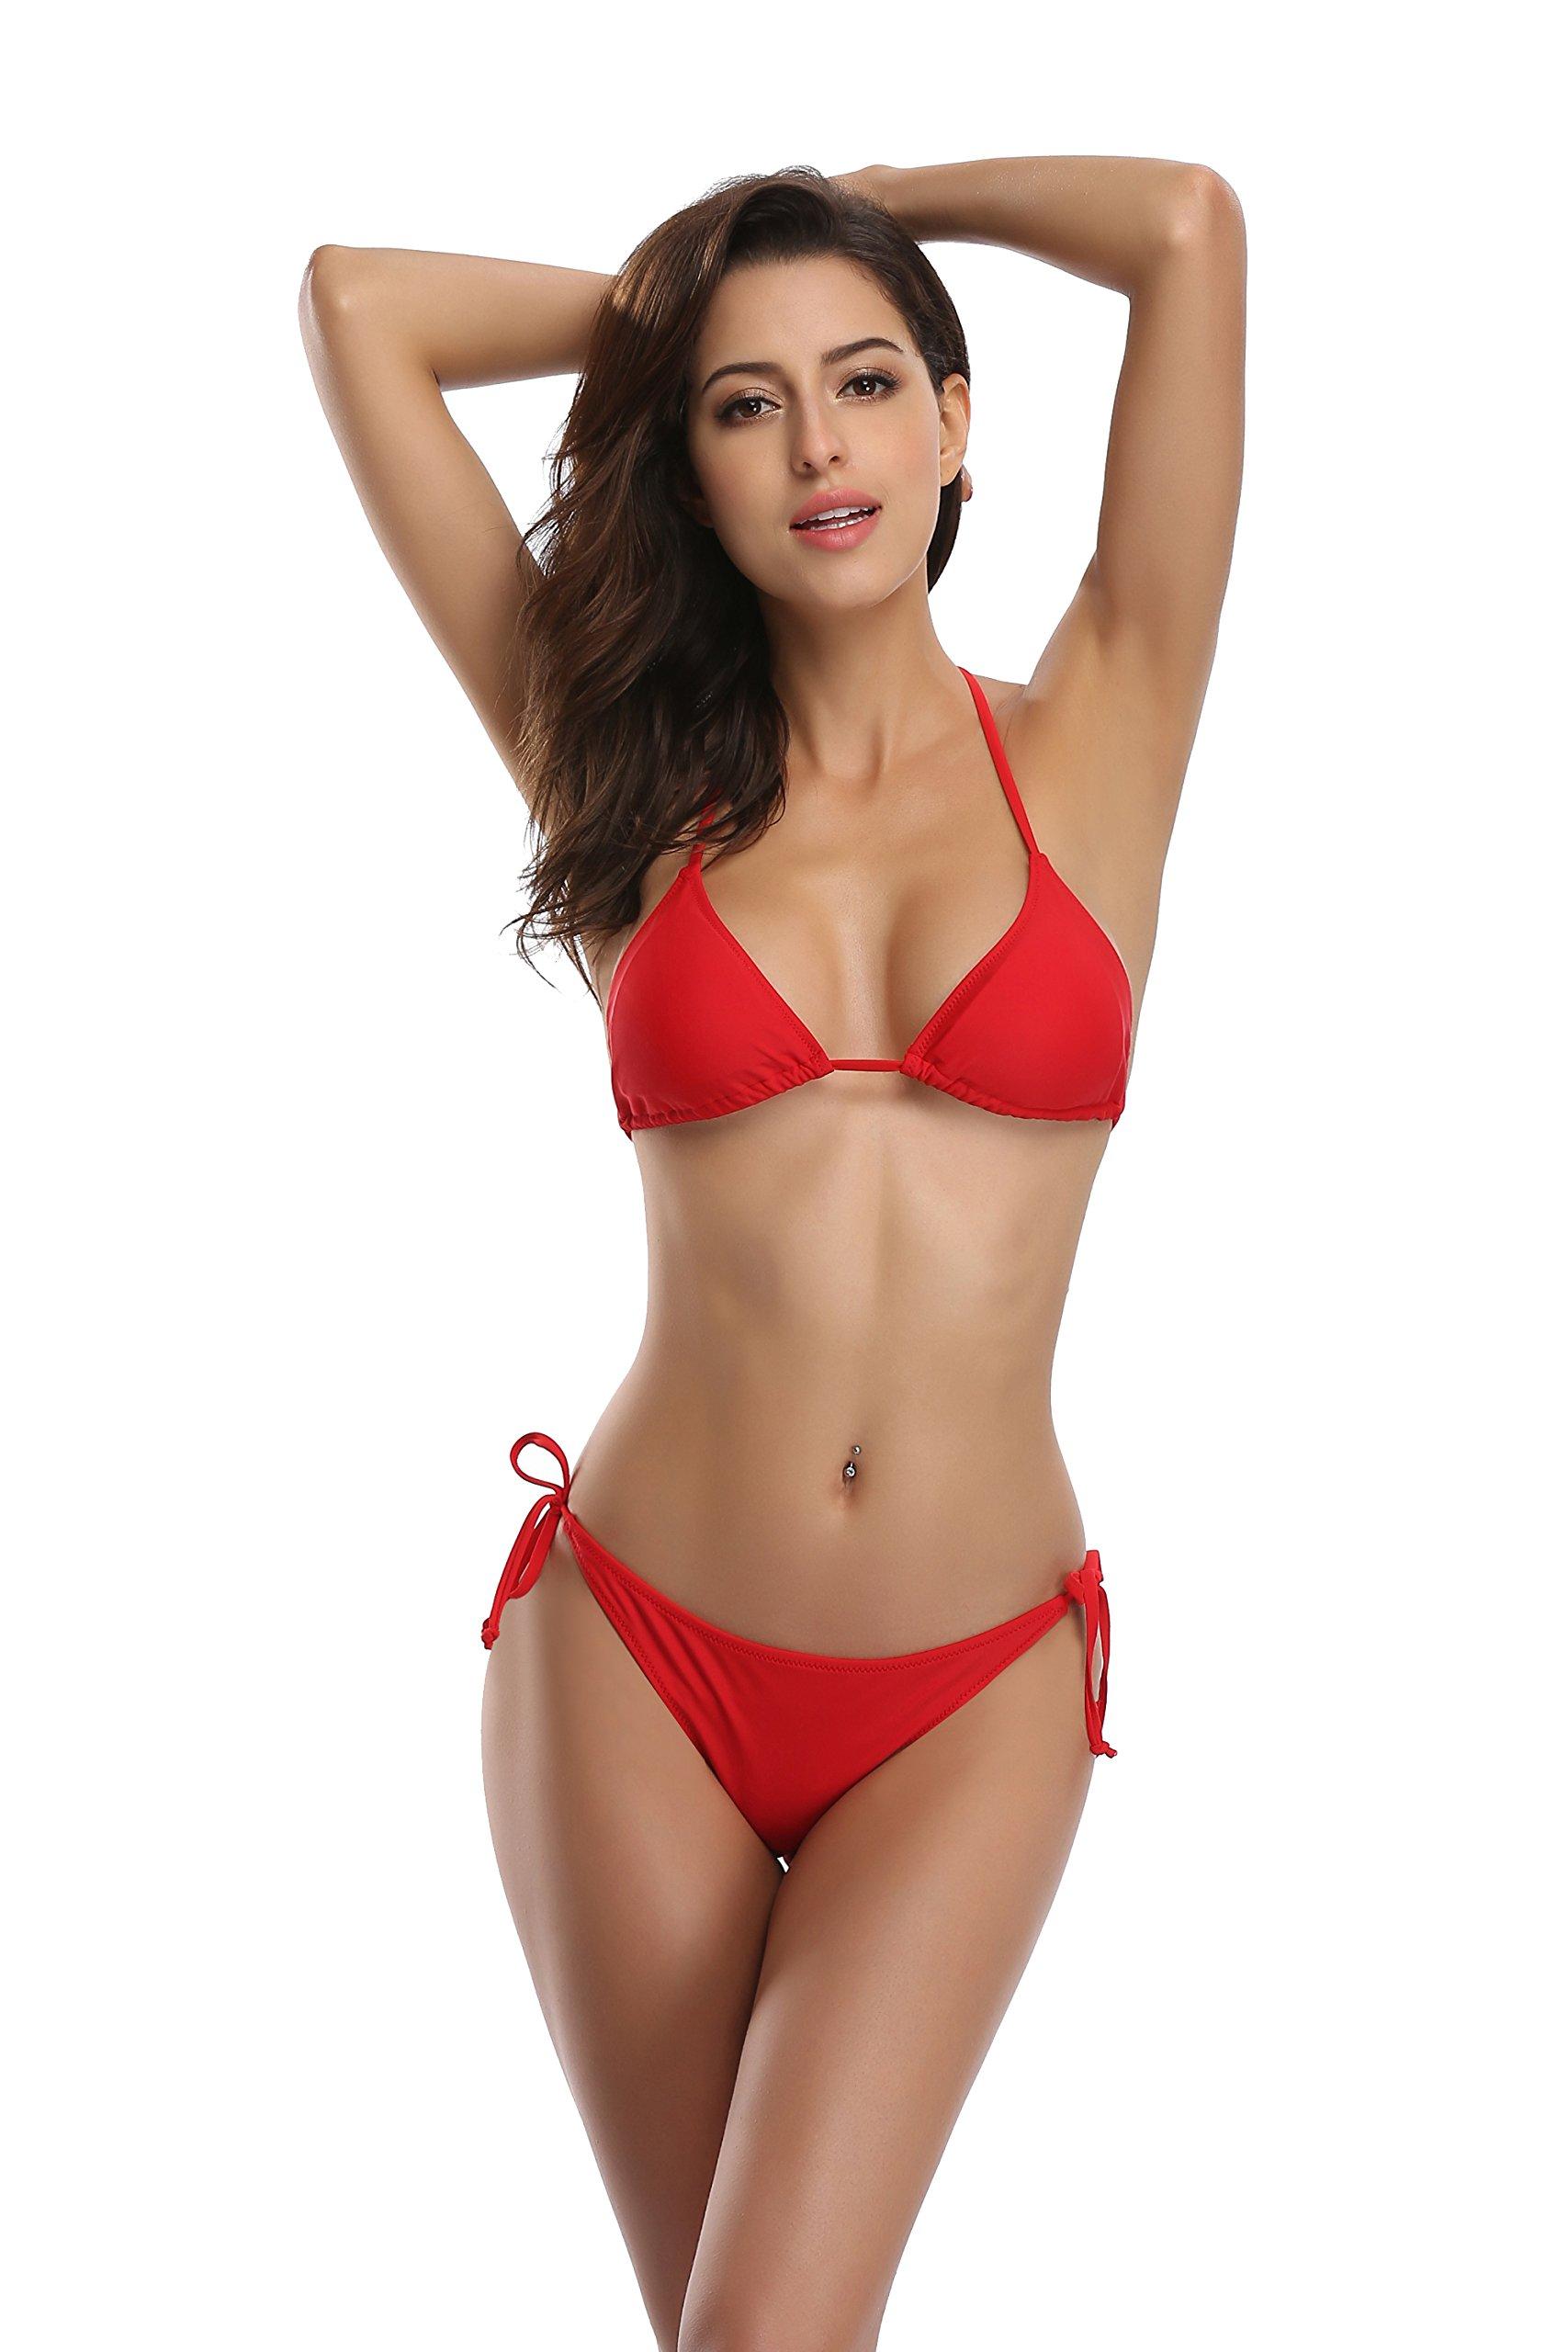 SHEKINI Women's Tie Side Bottom Push up Padded Top Triangle Bikini Bathing Suit (Rose red, Small)